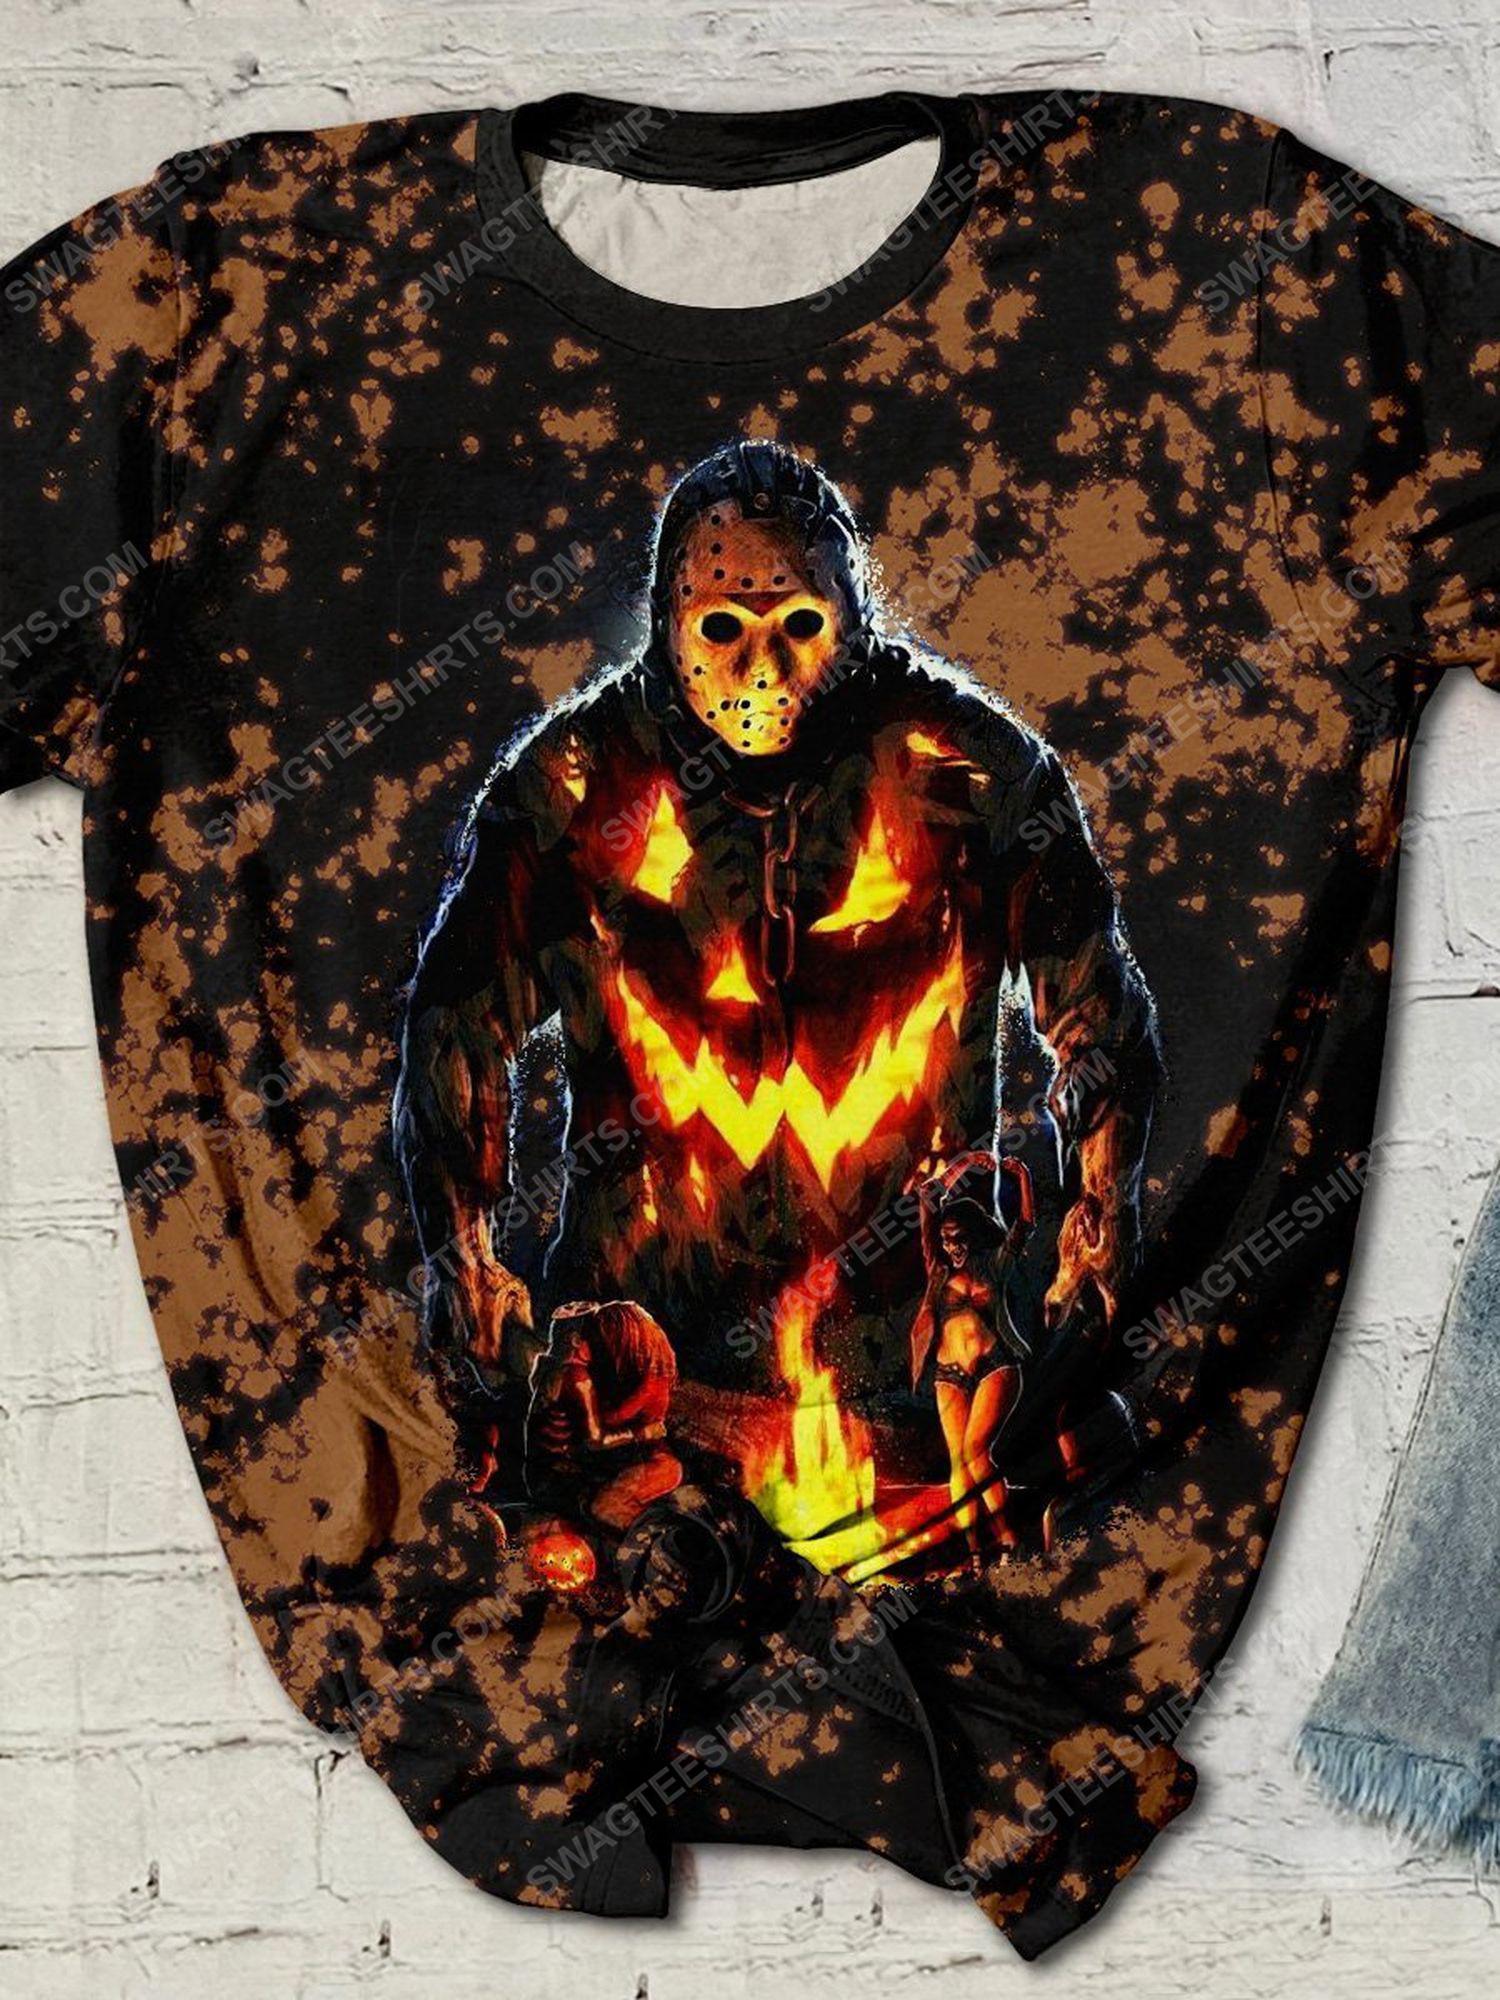 Halloween night jason voorhees friday the 13th shirt 1 - Copy (3)